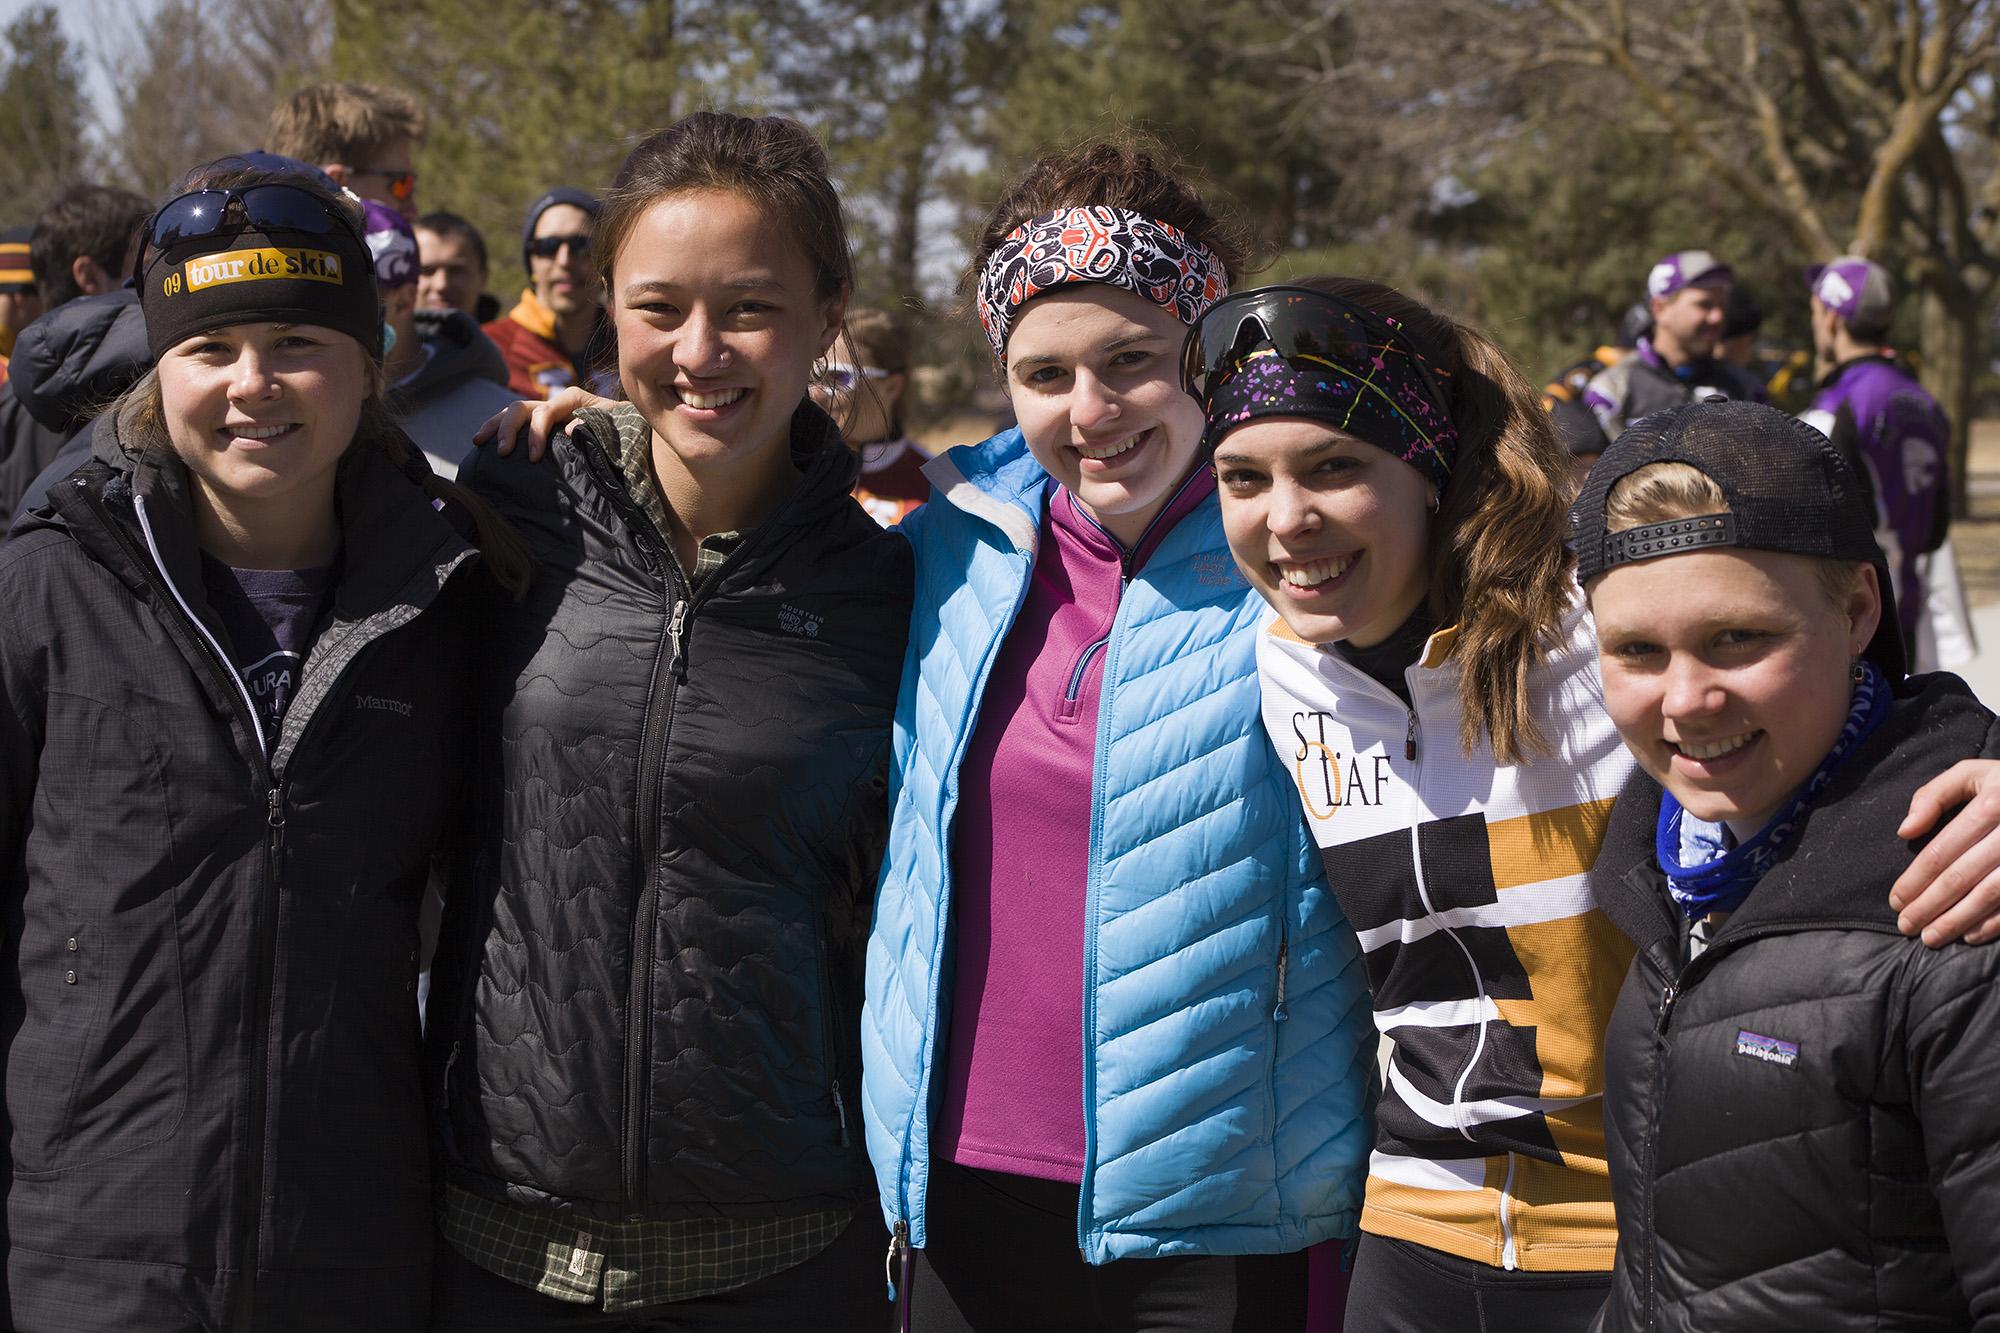 Bicycle racing girls. LP Photo Video. Omaha Photography.